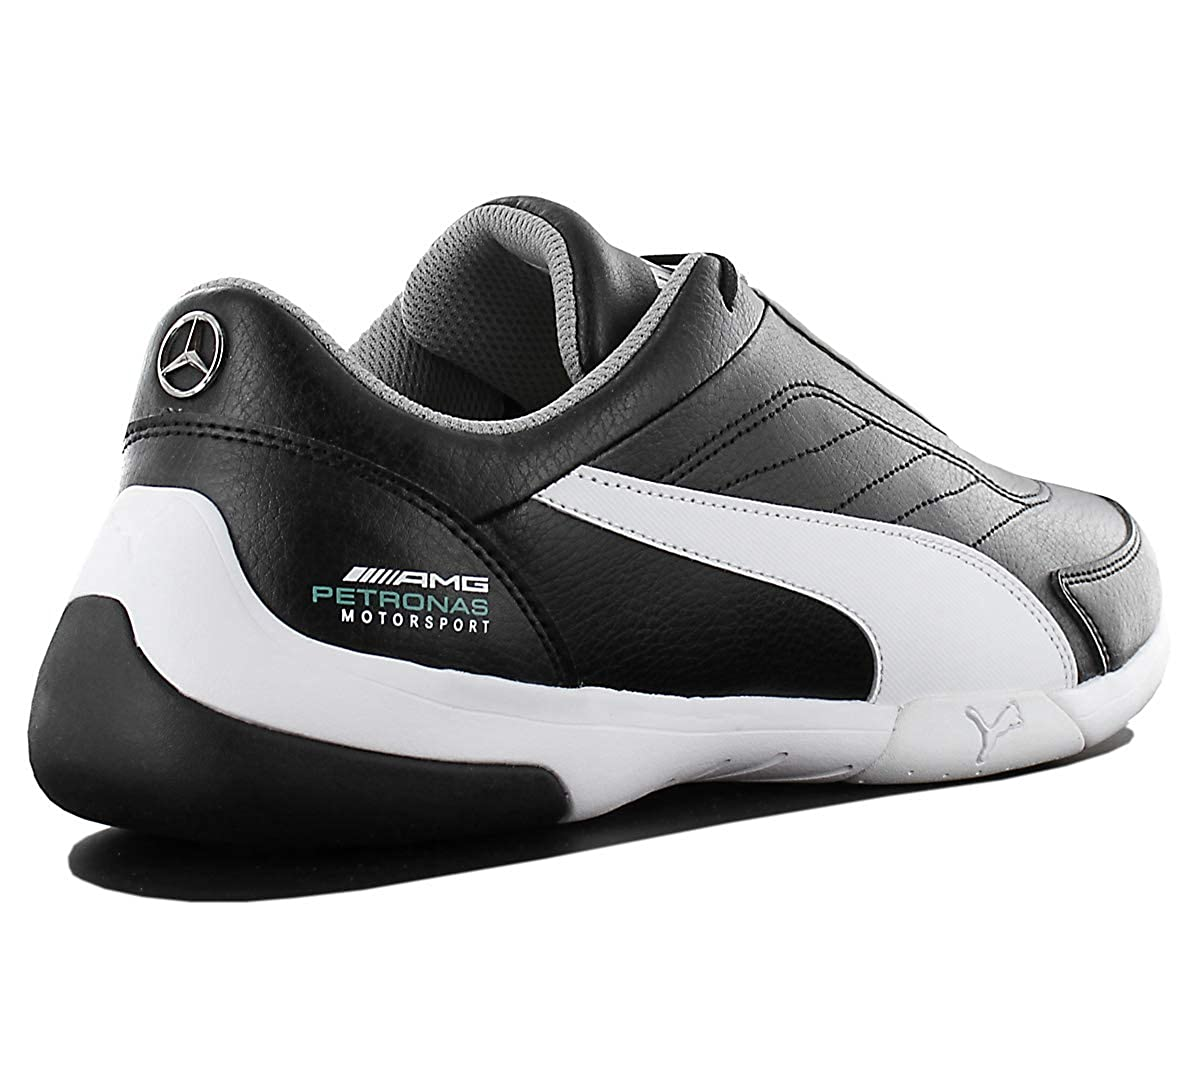 Puma Mercedes AMG Petronas Kart Cat III Black Men Trainers Sneaker  Motorsport Shoes 306244-02  Amazon.co.uk  Shoes   Bags 66cf458a8